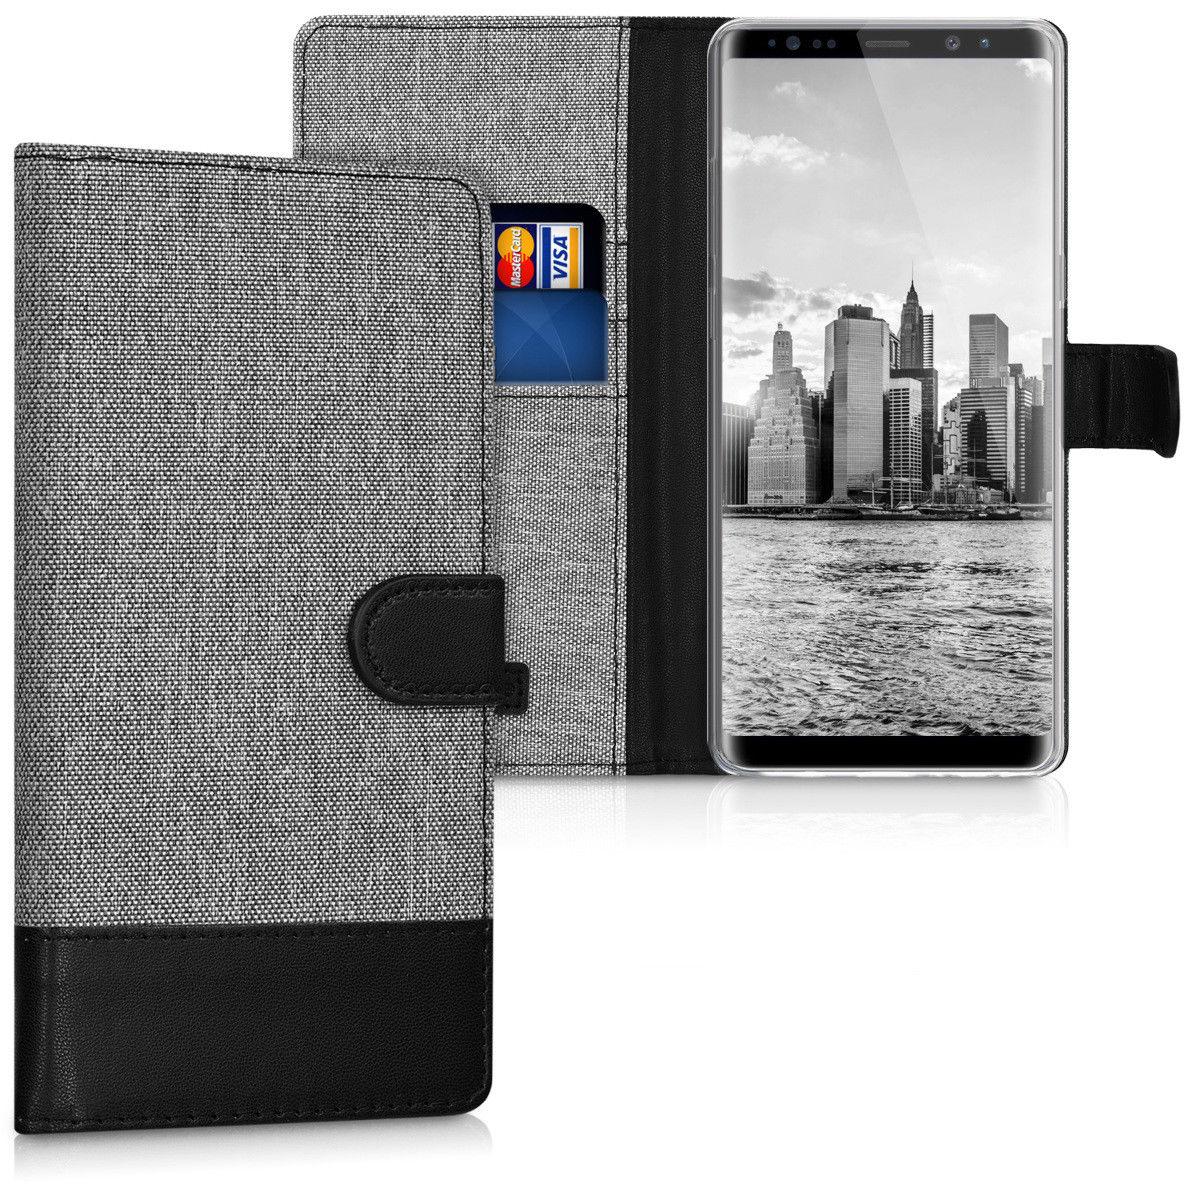 Pouzdro pro Samsung Galaxy Note 8 šedé